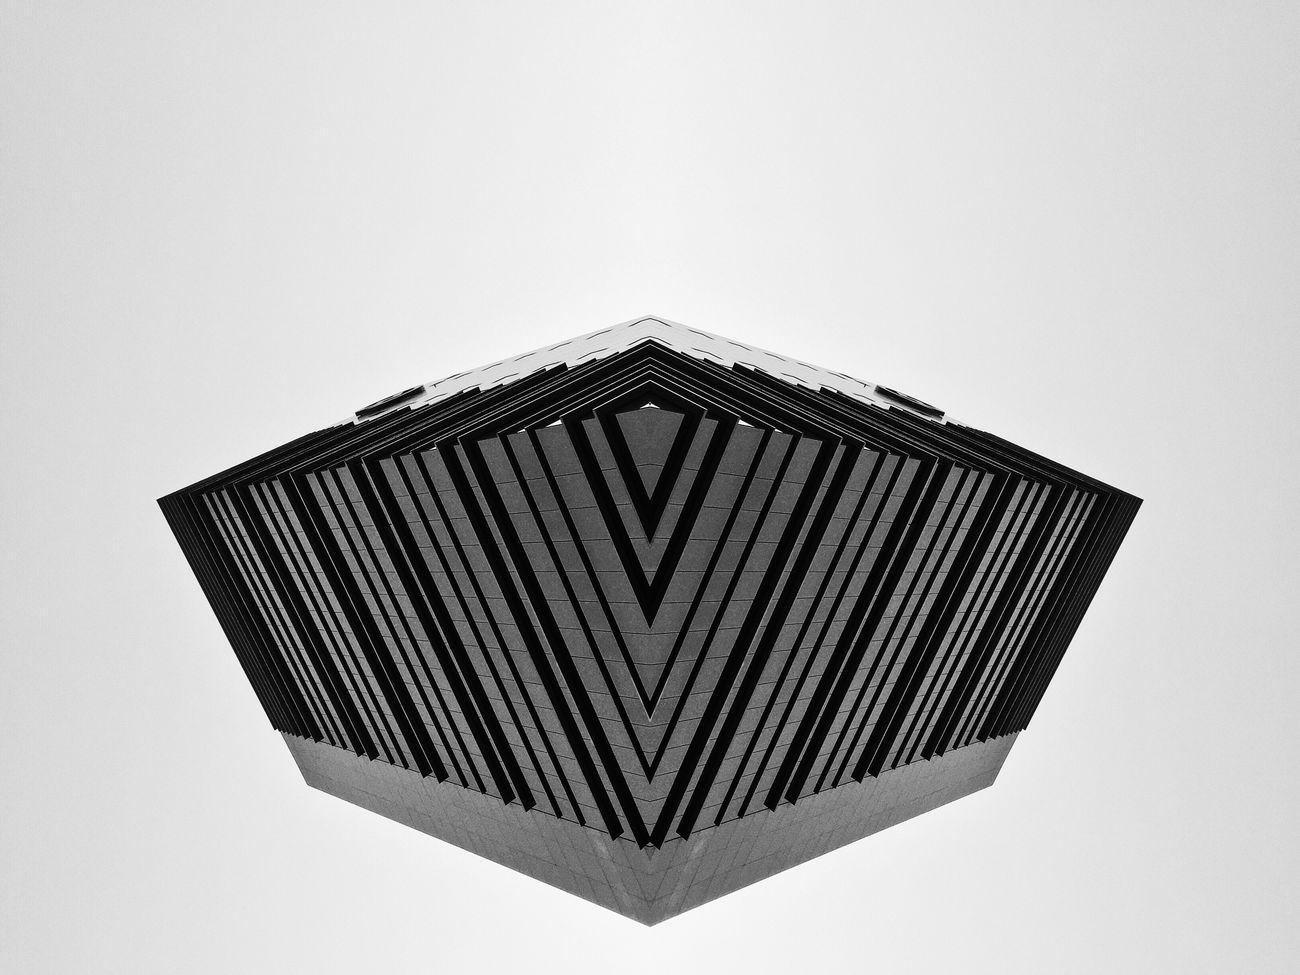 Unknown object Symmetryporn Symmetrical Symmetry Artistic Abstract Art Art Abstract Abstractart Doubleexposure Double Exposure Rearchitseries Abstractarchitecture Black & White Black And White Blackandwhite Blackandwhite Photography EyeEm Best Shots - Black + White Monochrome Monochromatic